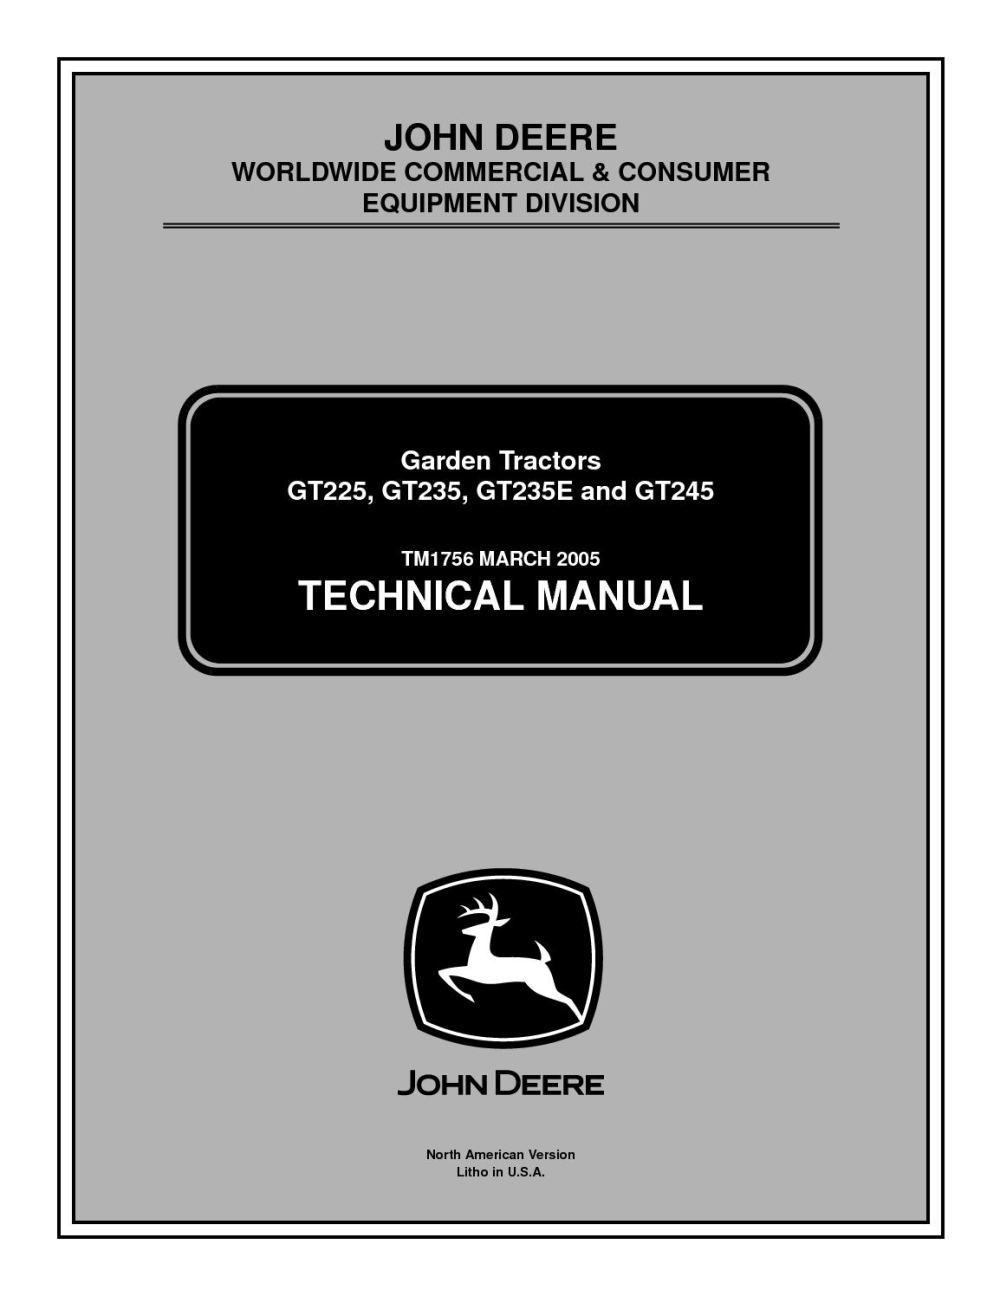 medium resolution of calam o john deere gt245 lawn garden tractor service repair manual